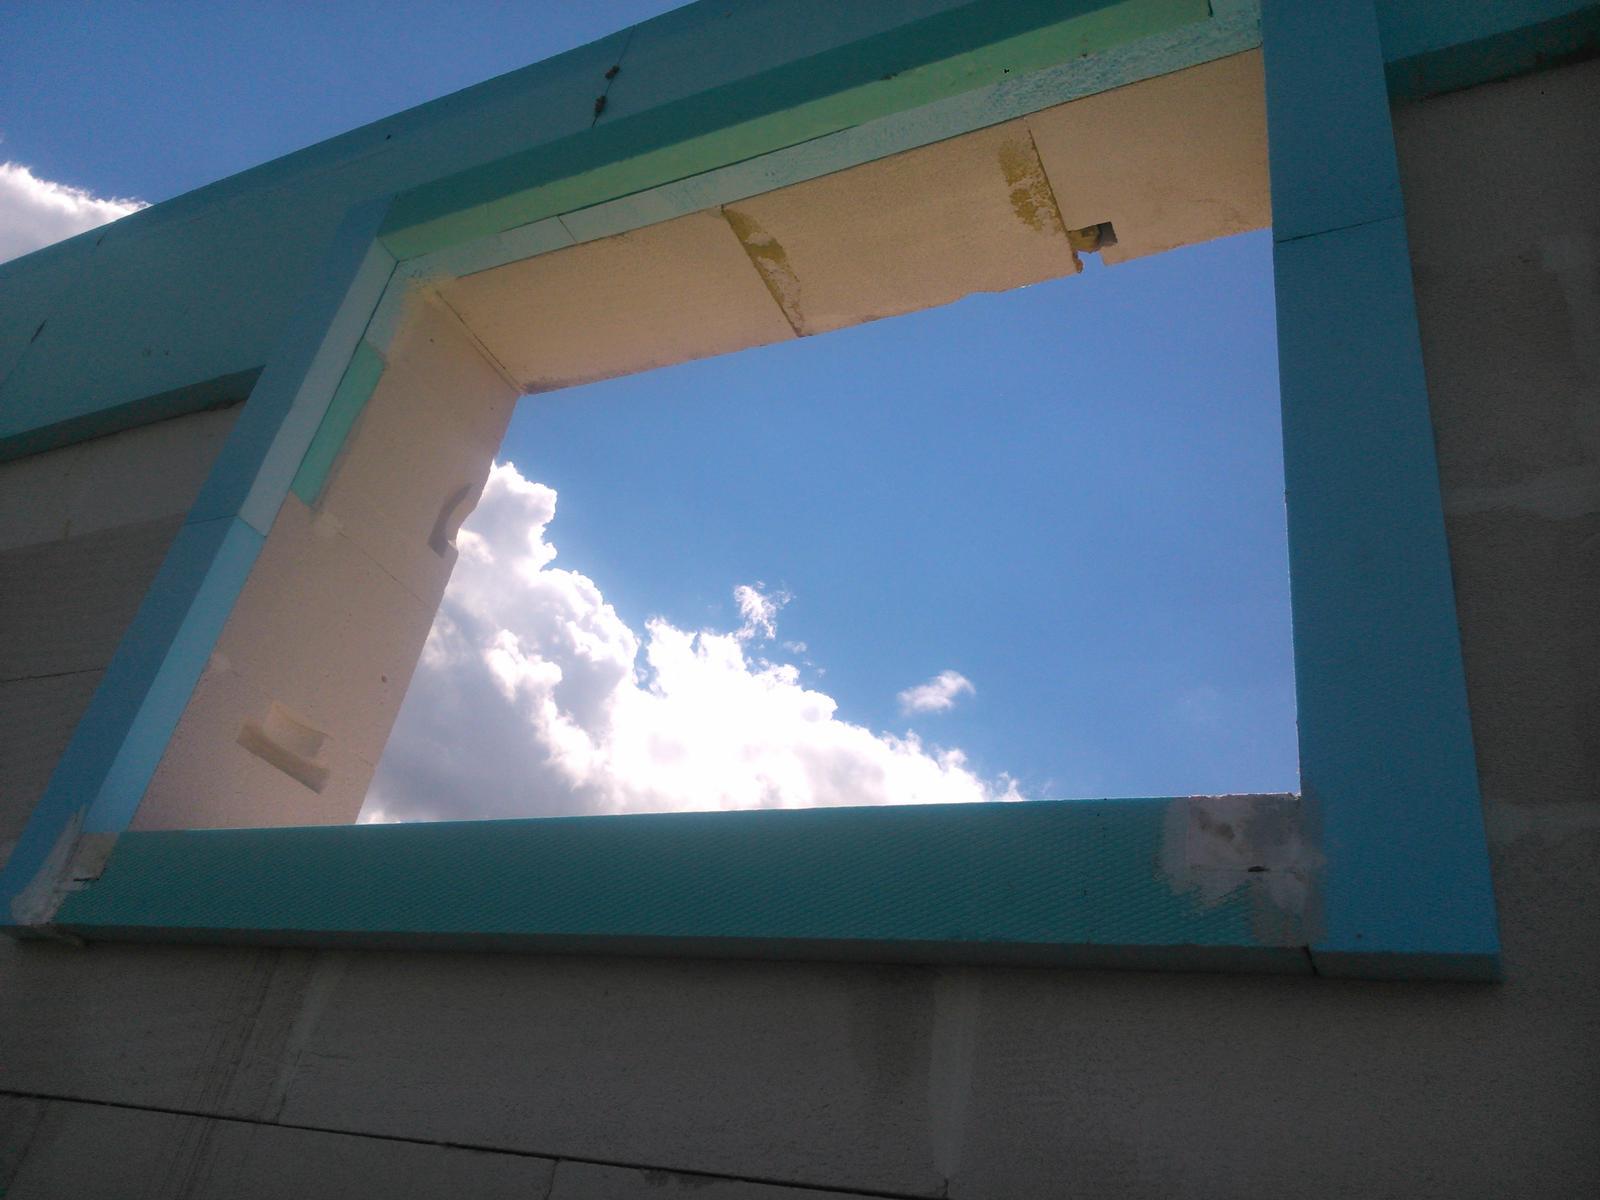 Domček pre moju rodinku :) - toto je mensie fixne okno tak tu nieje vysadny ytong ale CompactFoam kocky 5x 6 cm, mal som vzorku tak som ju takto vyuzil